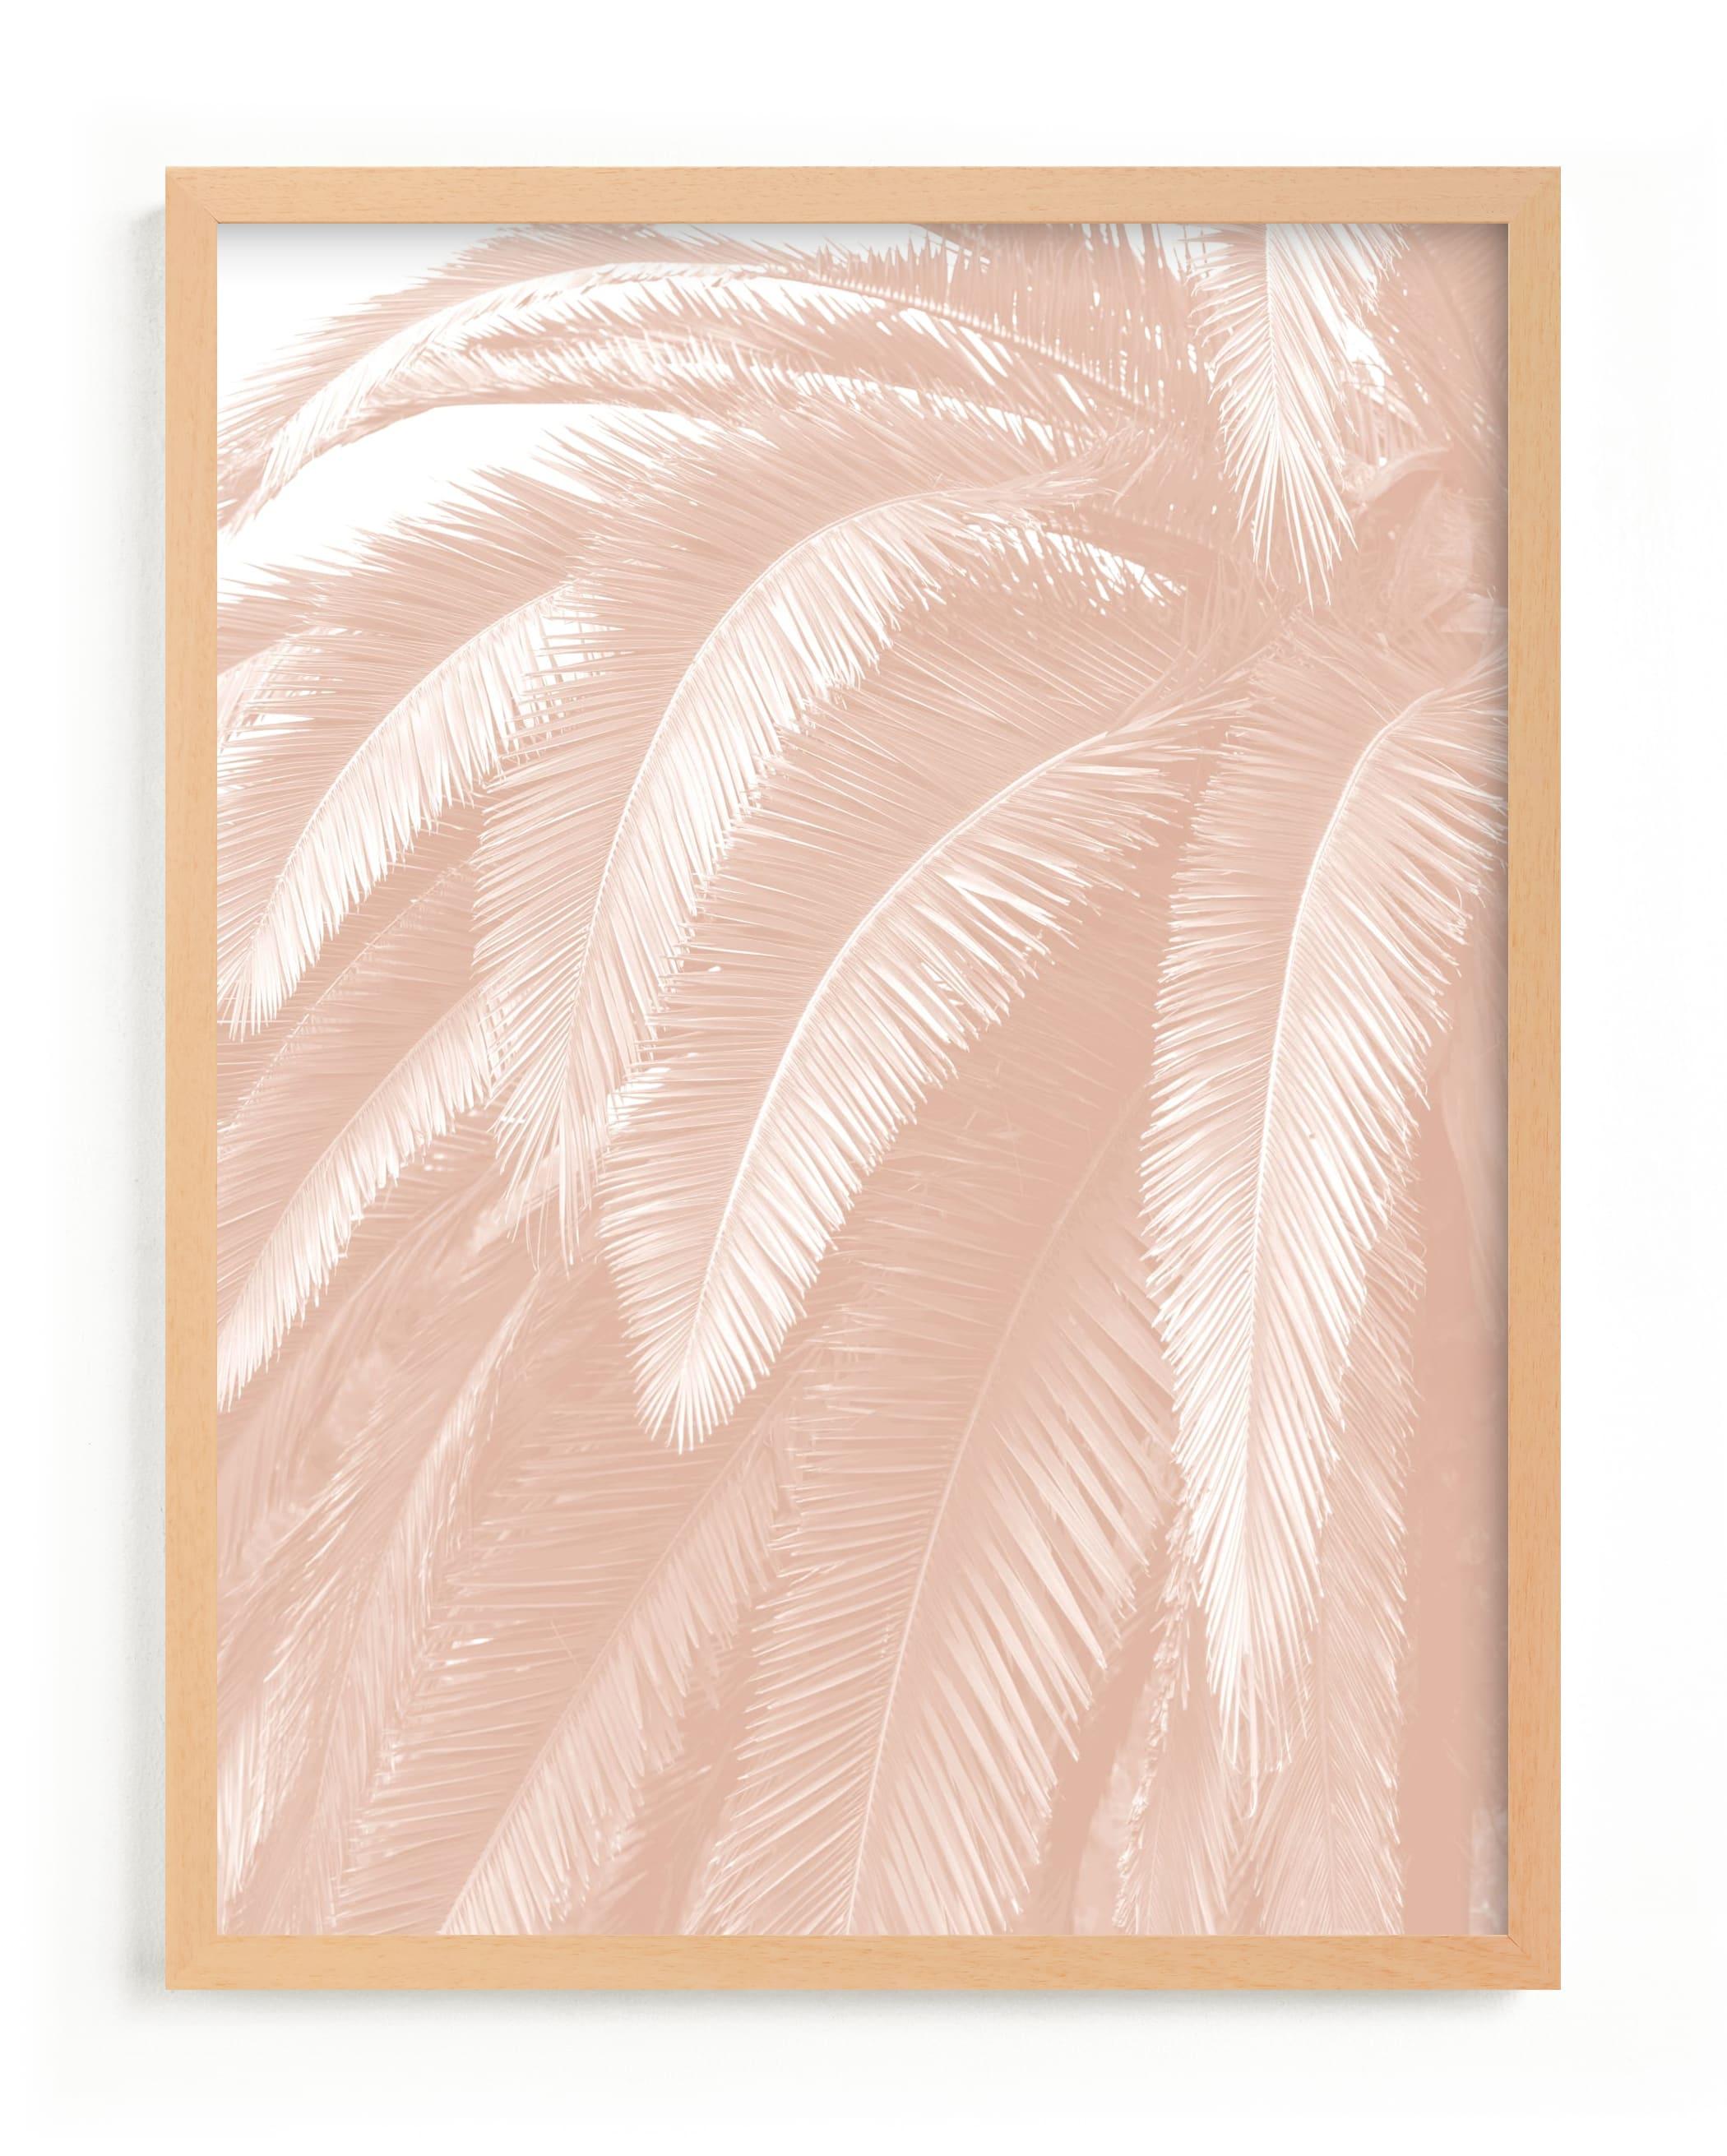 Soft Palm Top Children's Art Print